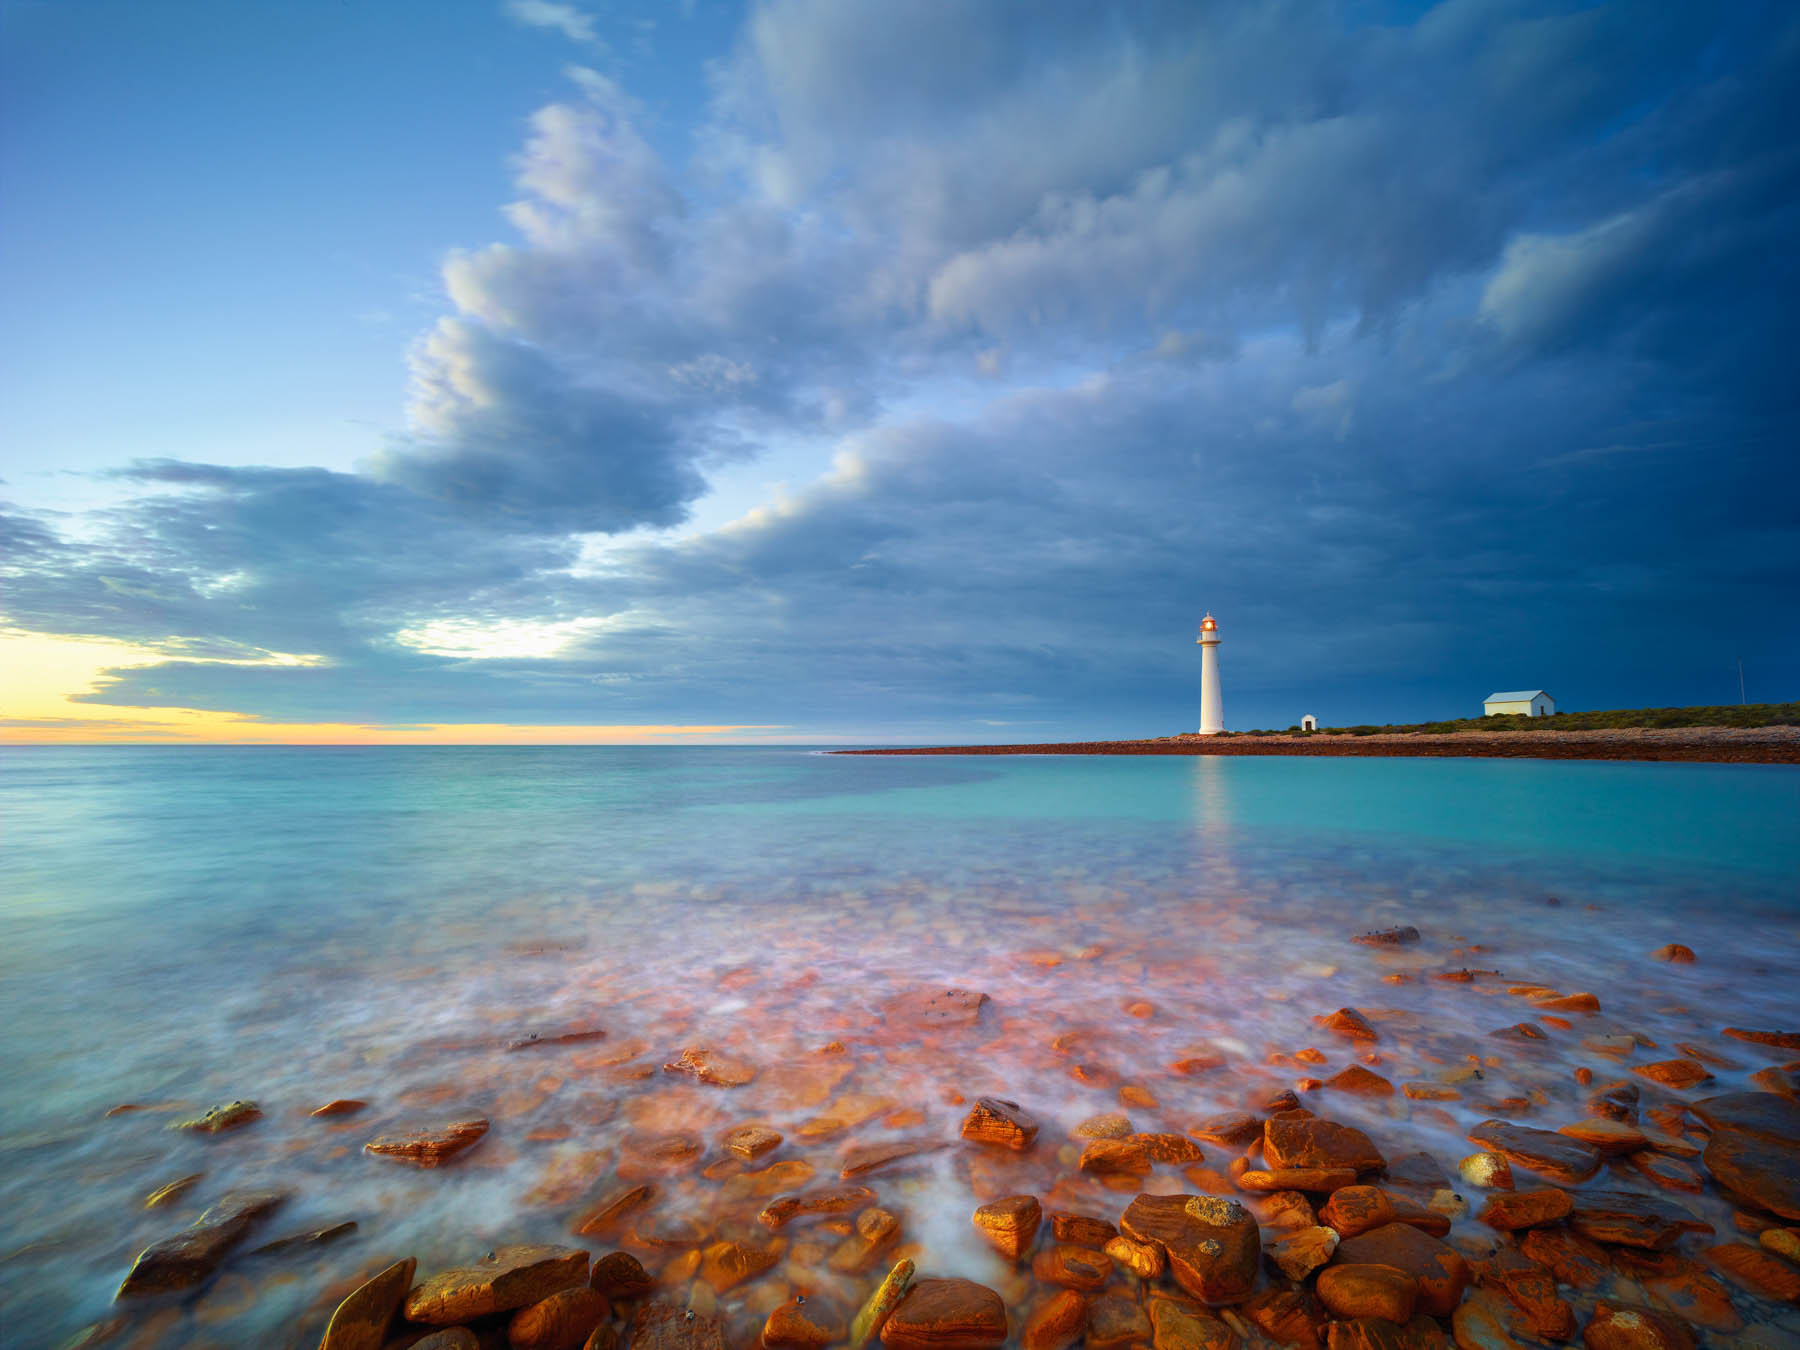 Point Lowly Lighthouse at sunrise, Spencer Gulf, SA, Australia.